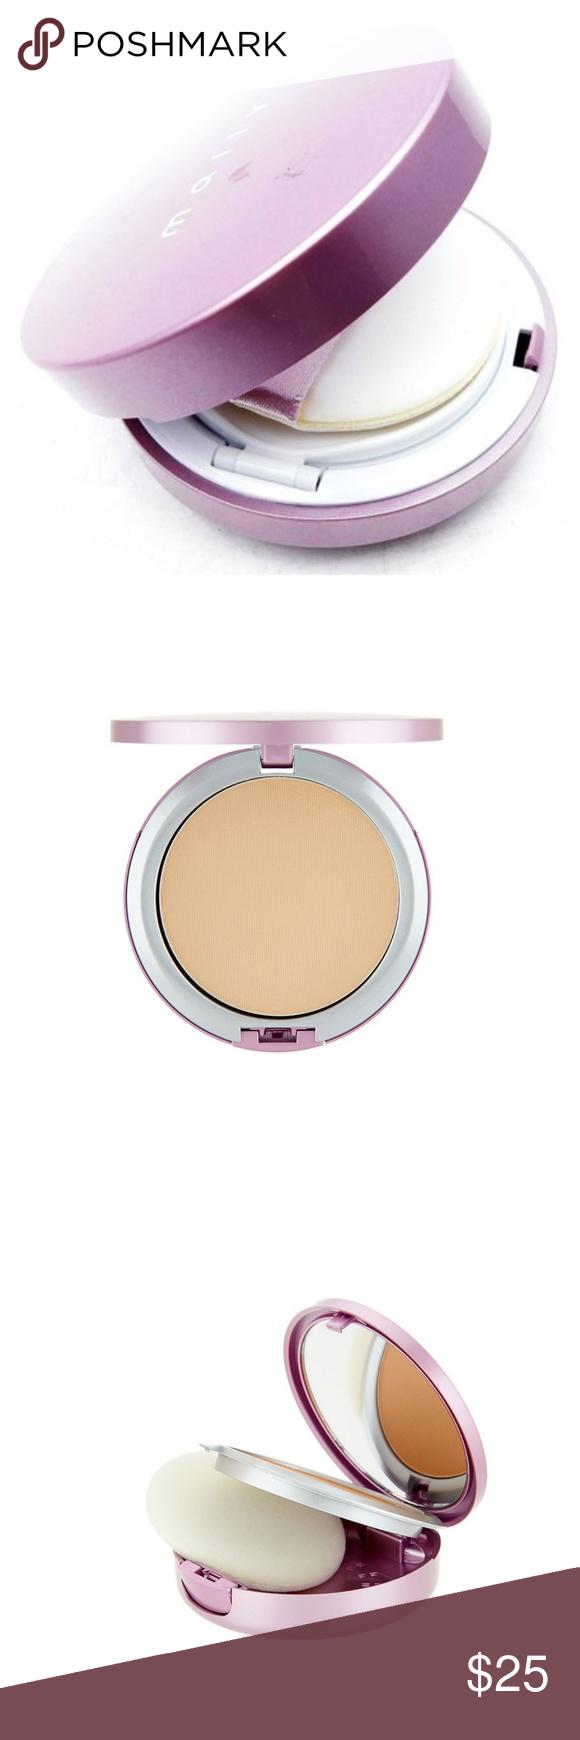 Mally Beauty Poreless Perfection Fluid Foundation NWT